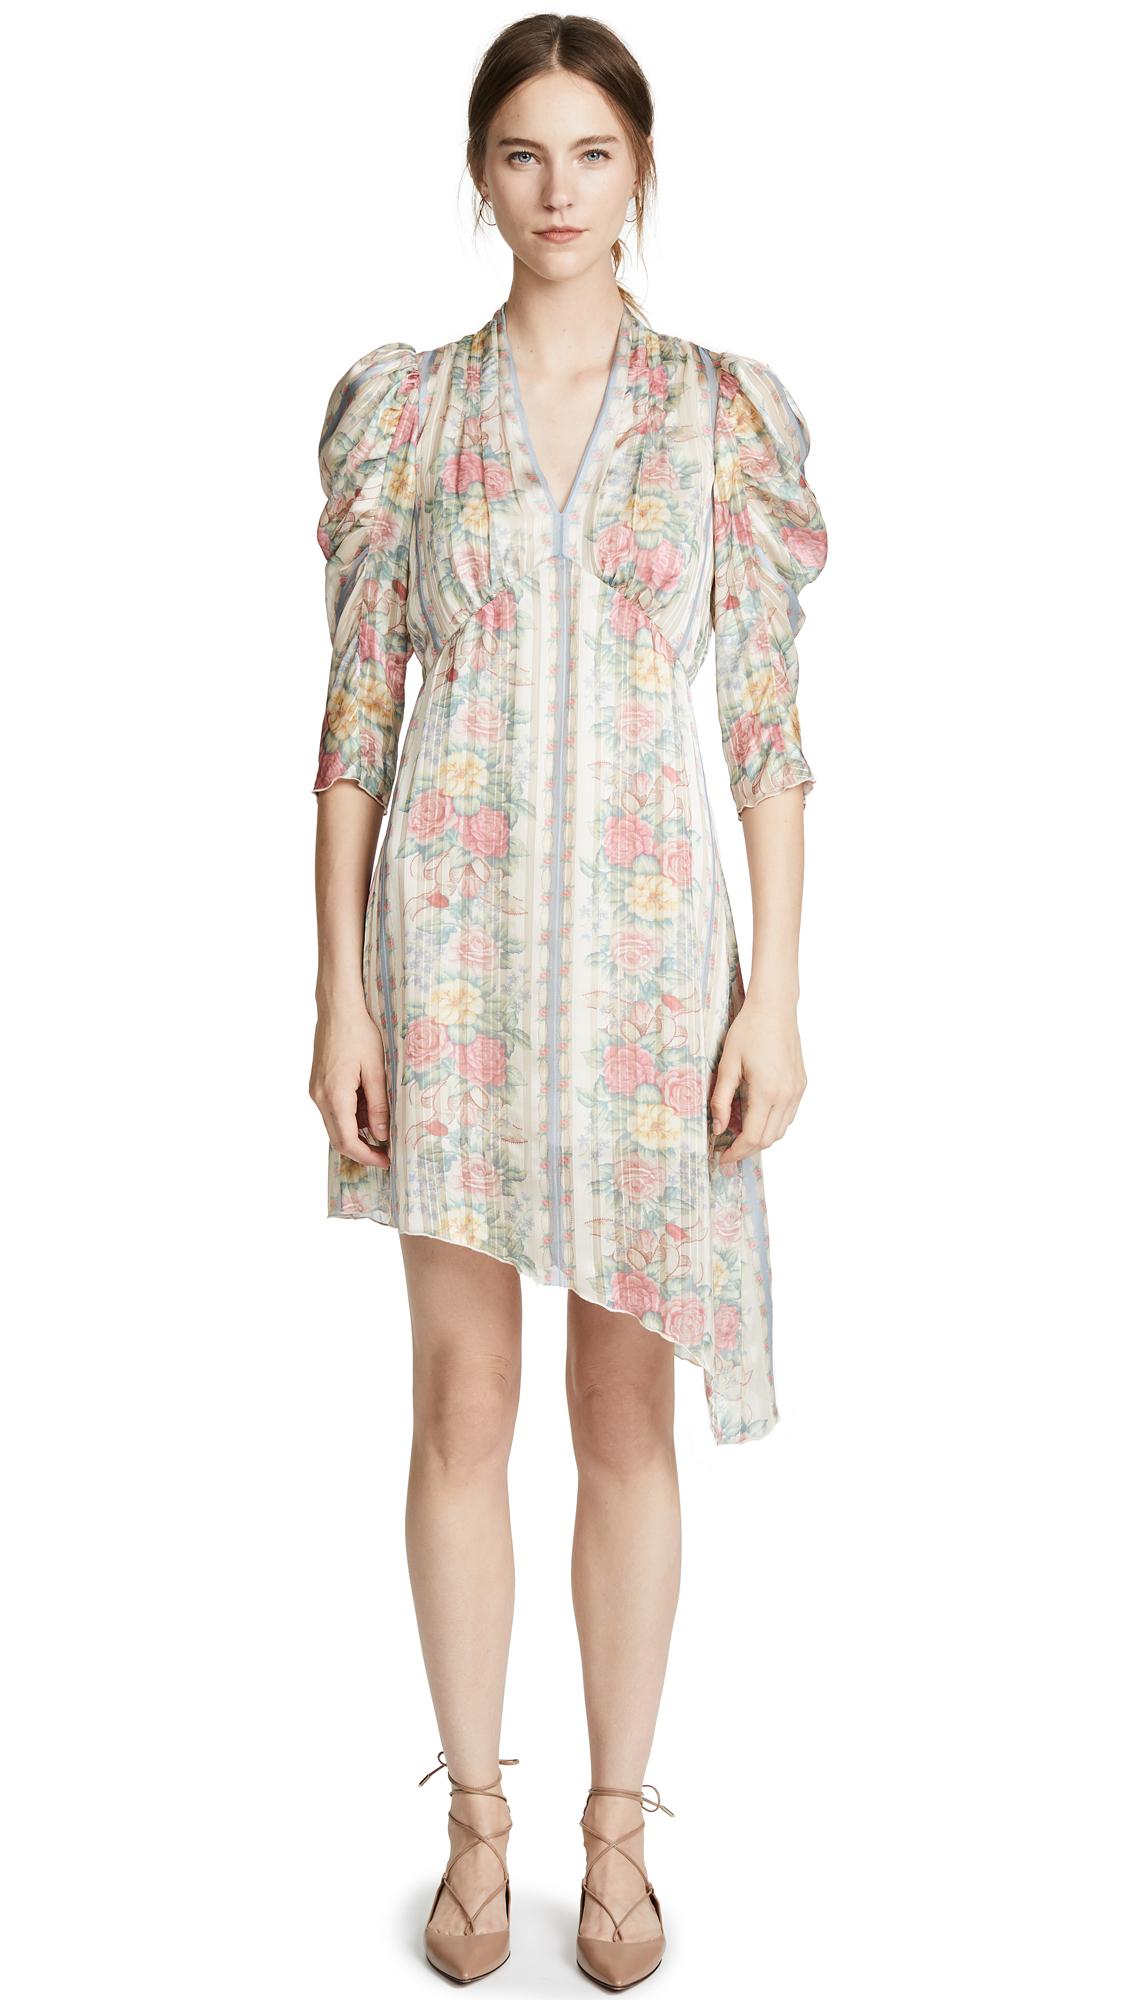 Anna Sui Whisper Rose Dress